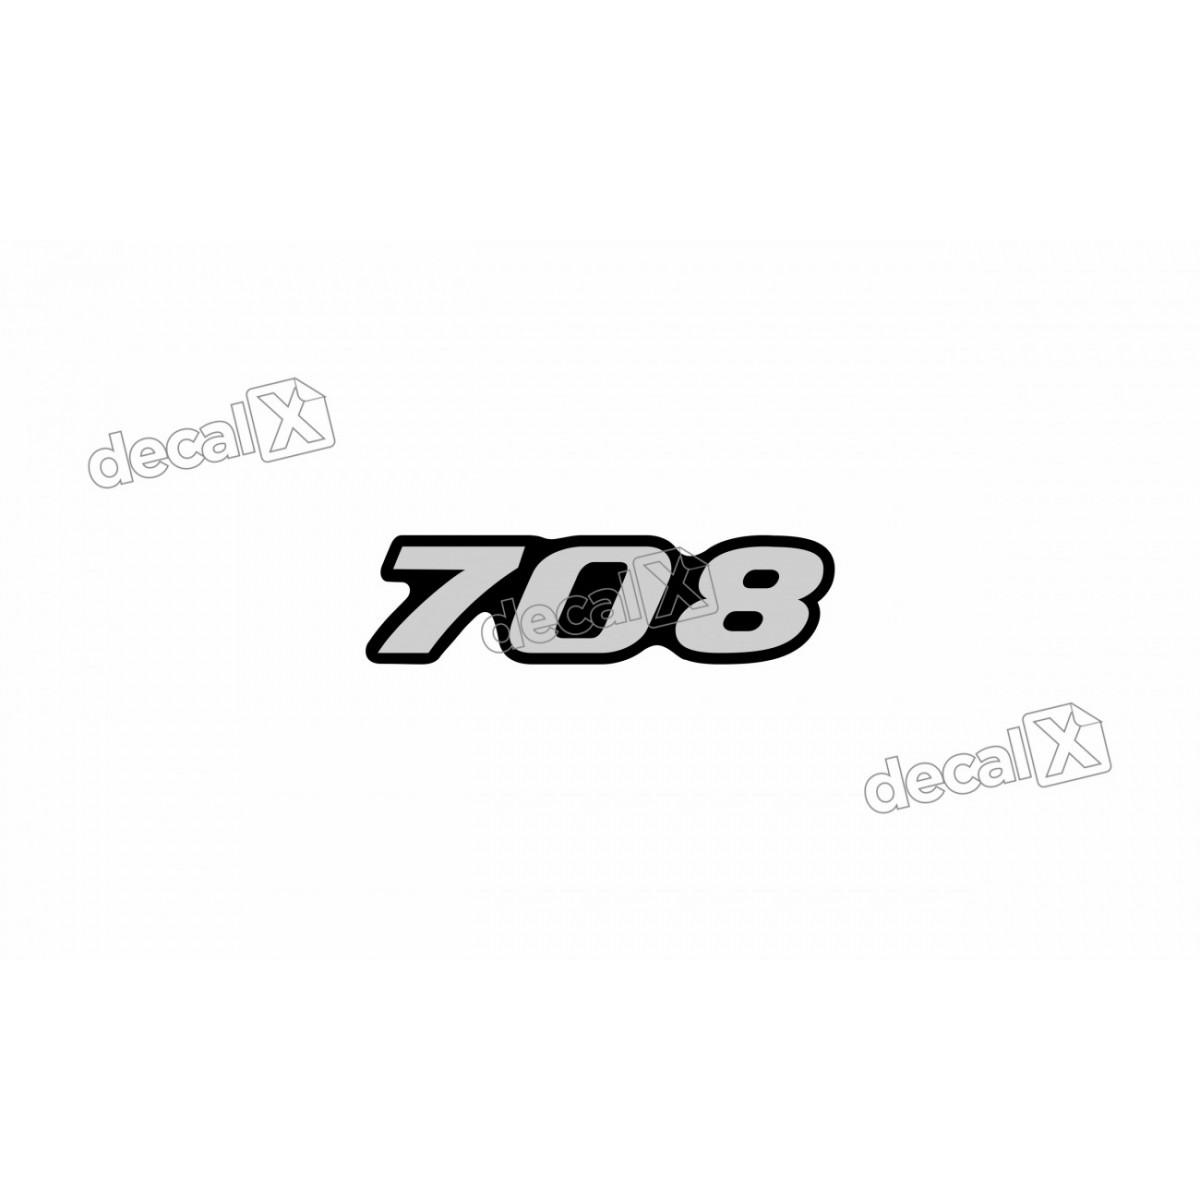 Adesivo Emblema Resinado Mercedes 708 Cm4 Decalx